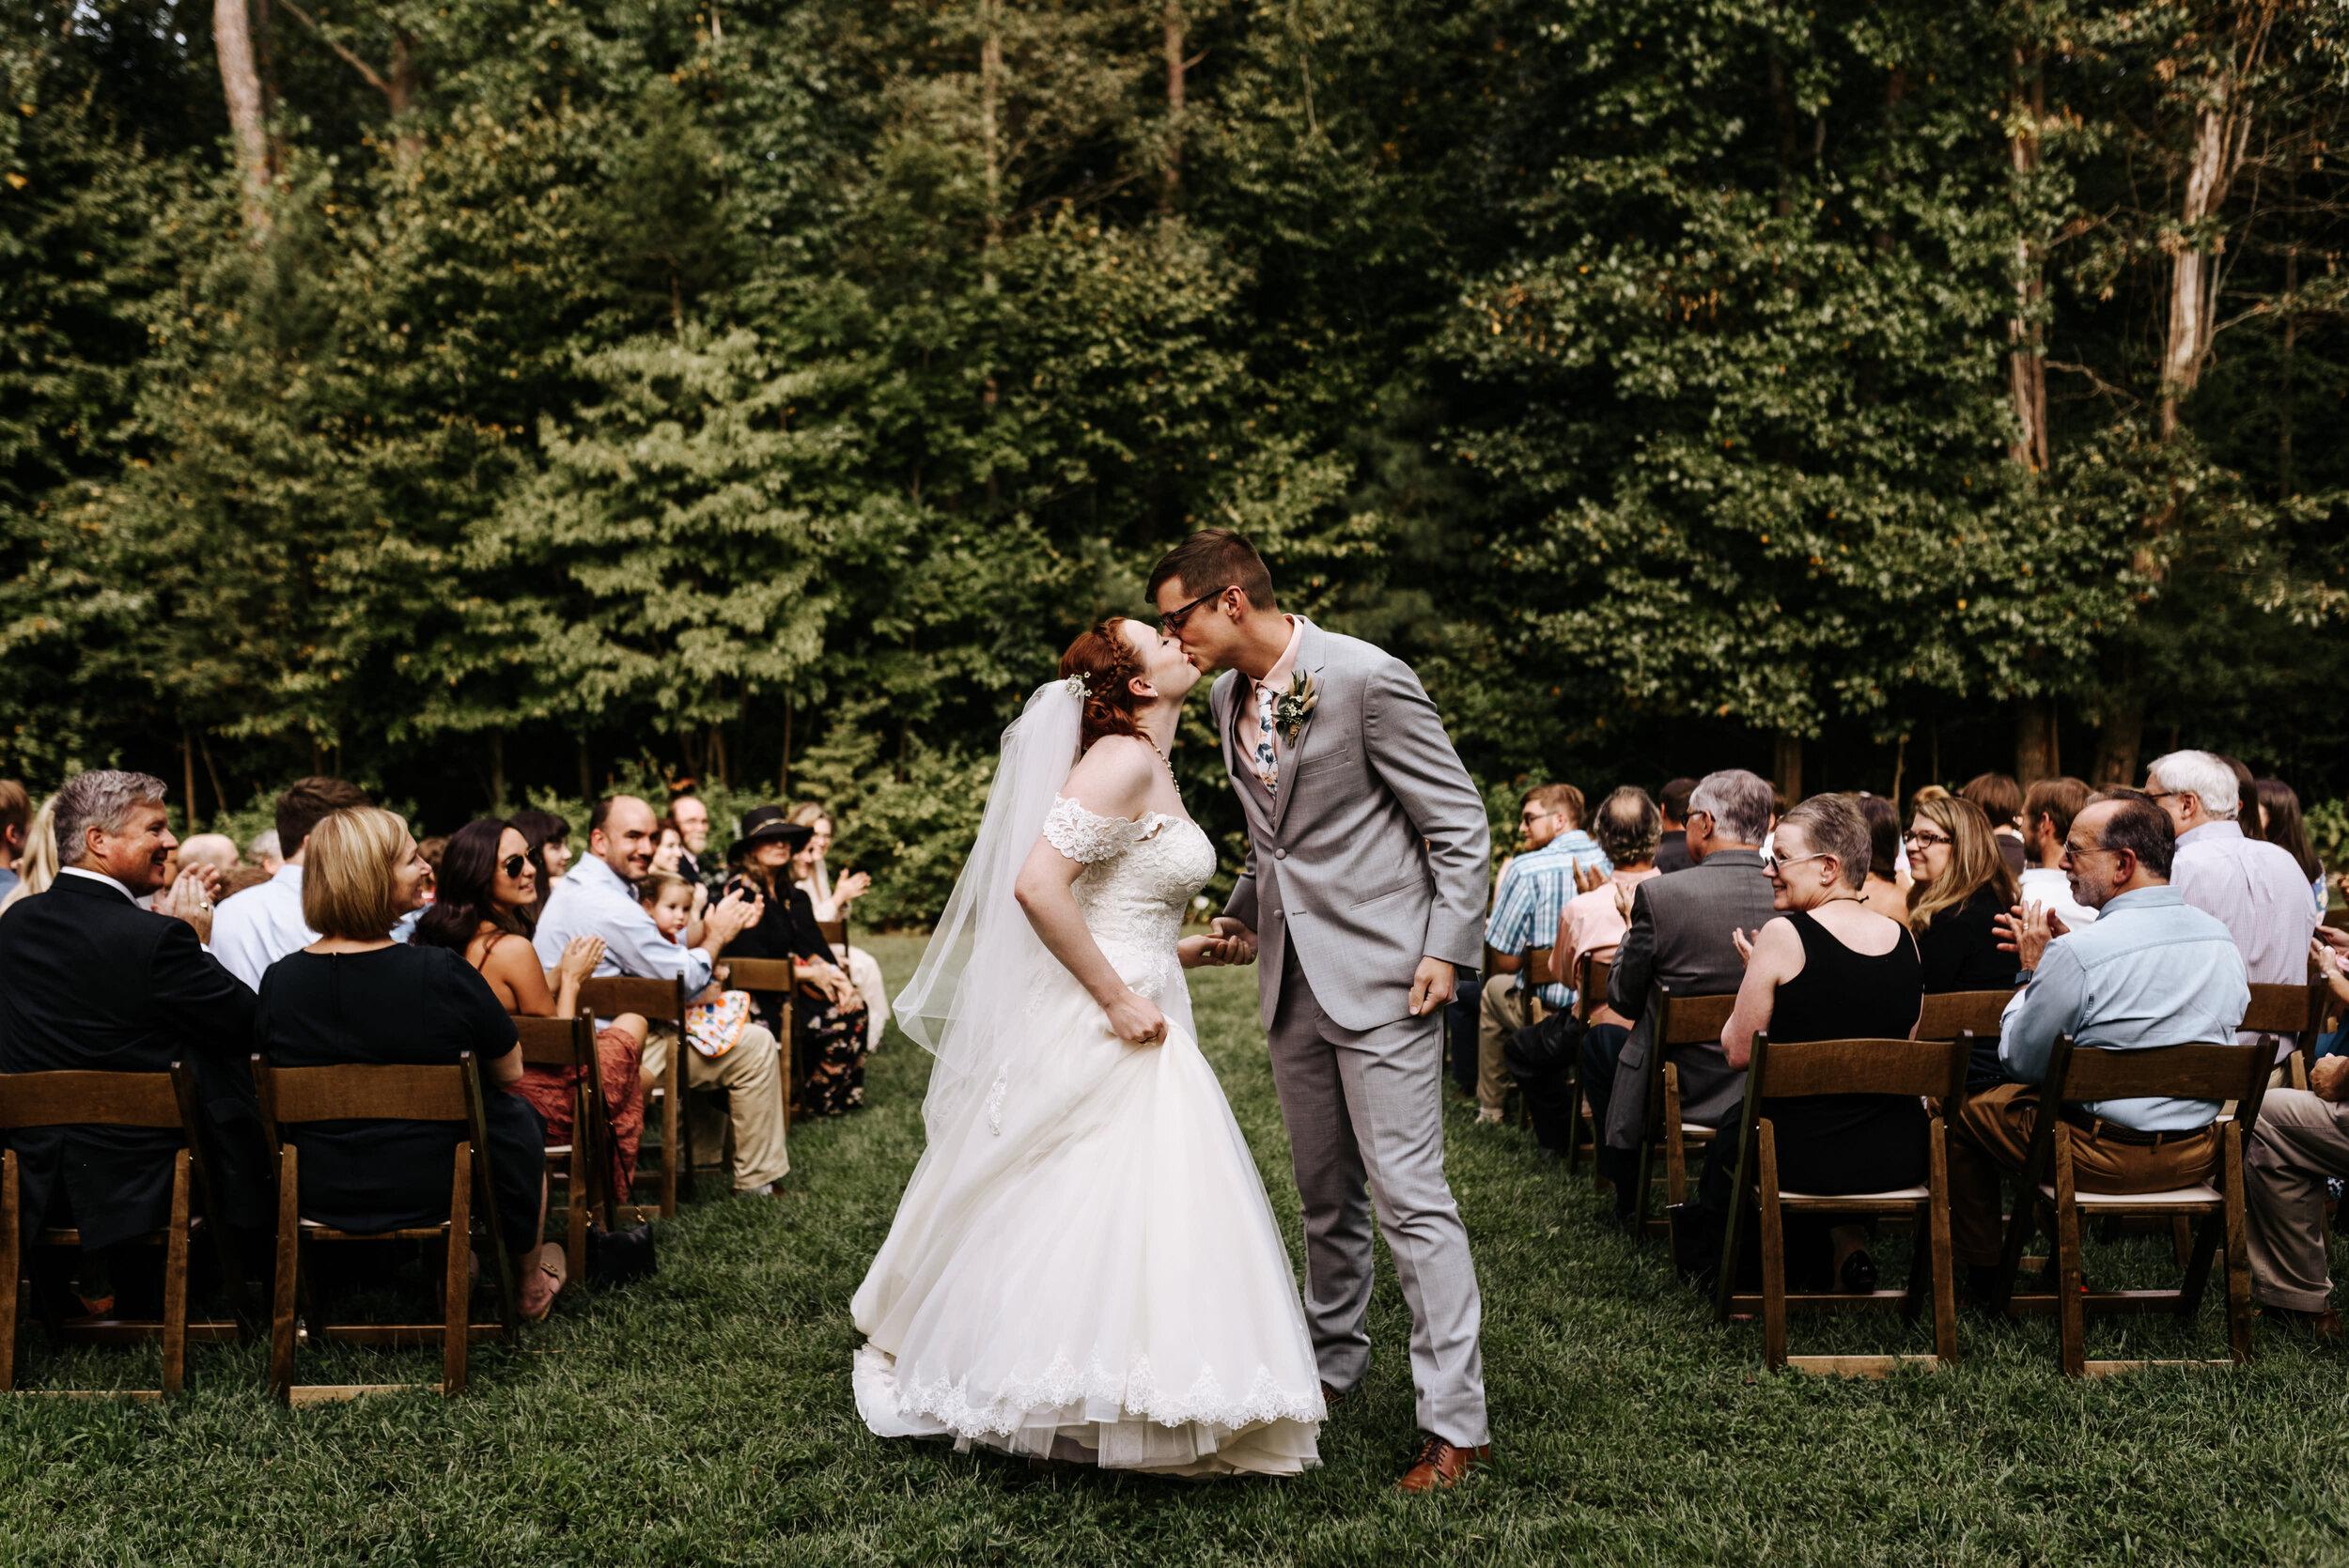 Rachel_David_Wedding_Richmond_Virginia_Photography_by_V_28.jpg